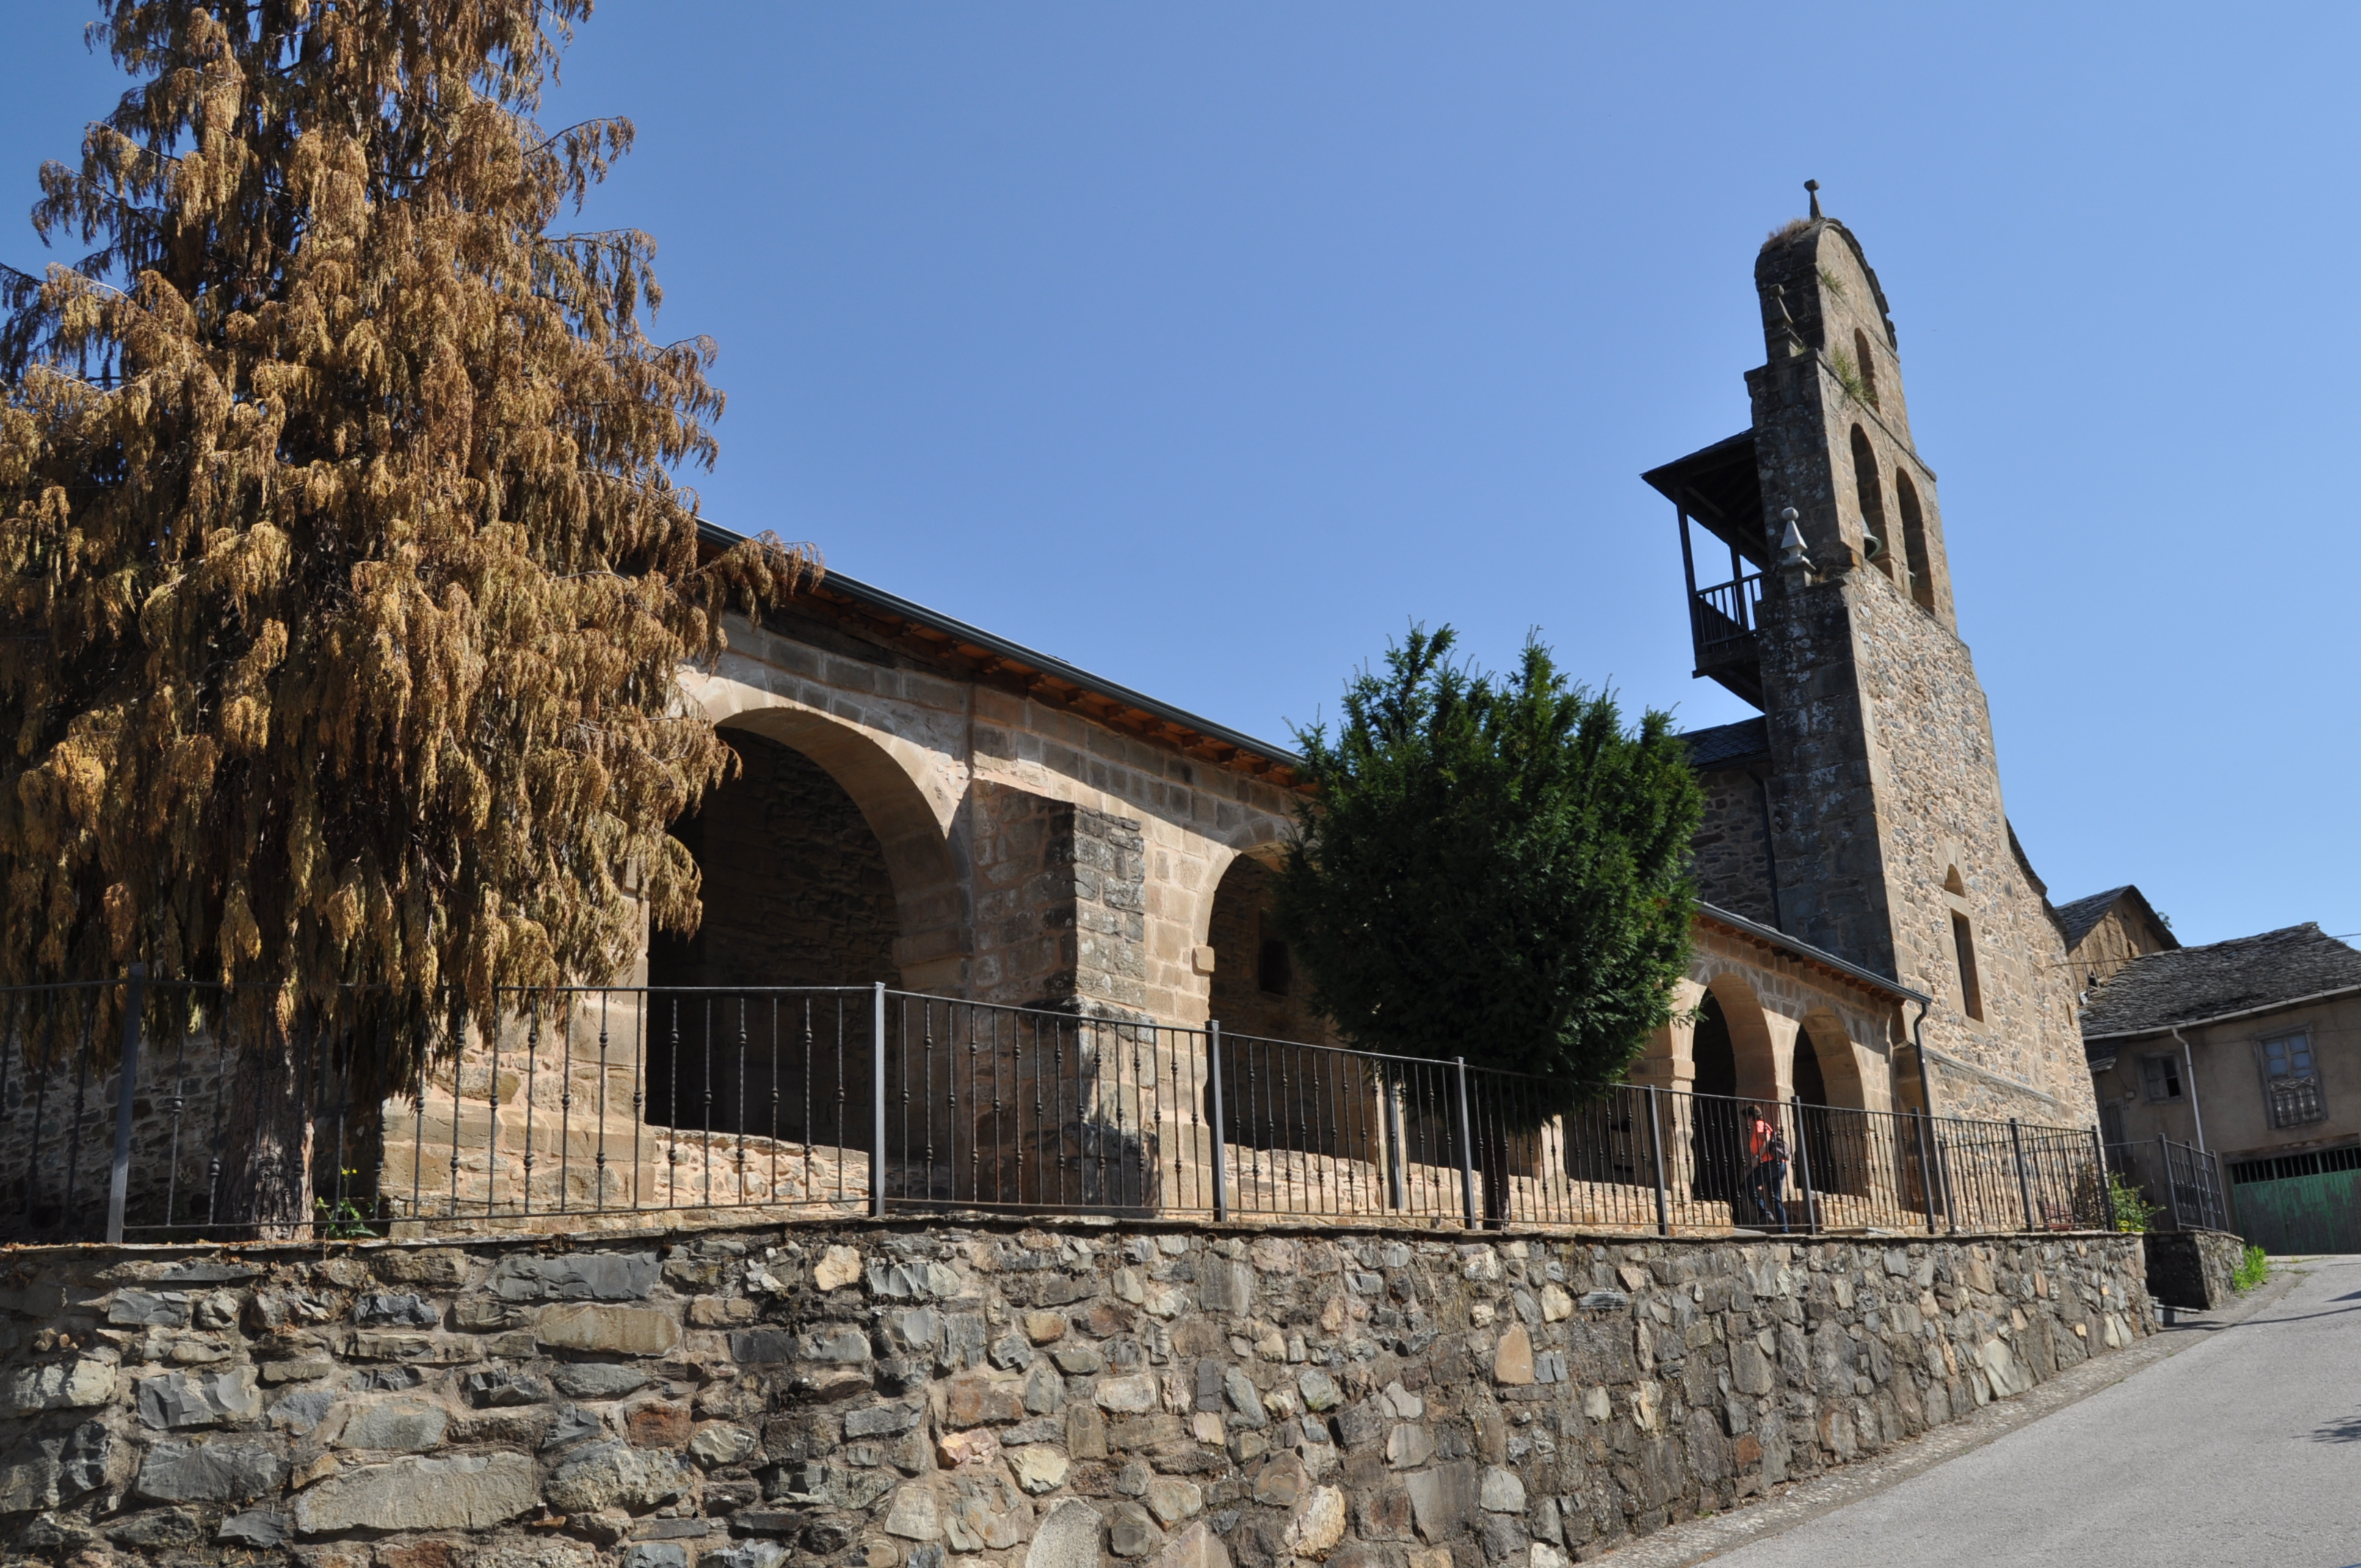 La gran iglesia San Pedro, en Noceda del Bierzo (s. XVII).